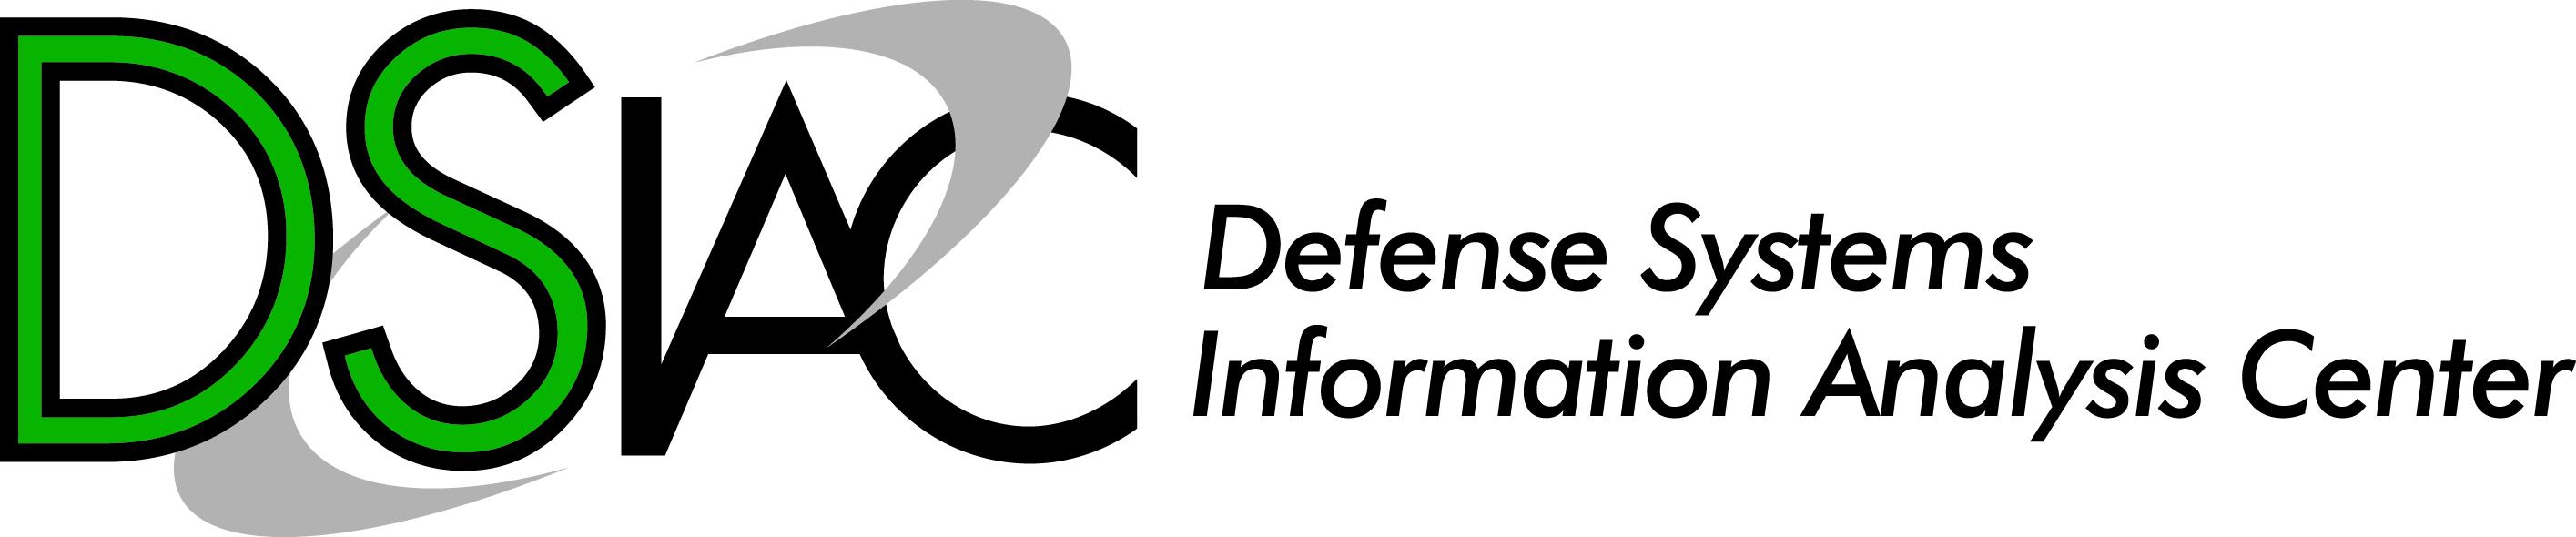 DSIAC-standard-color